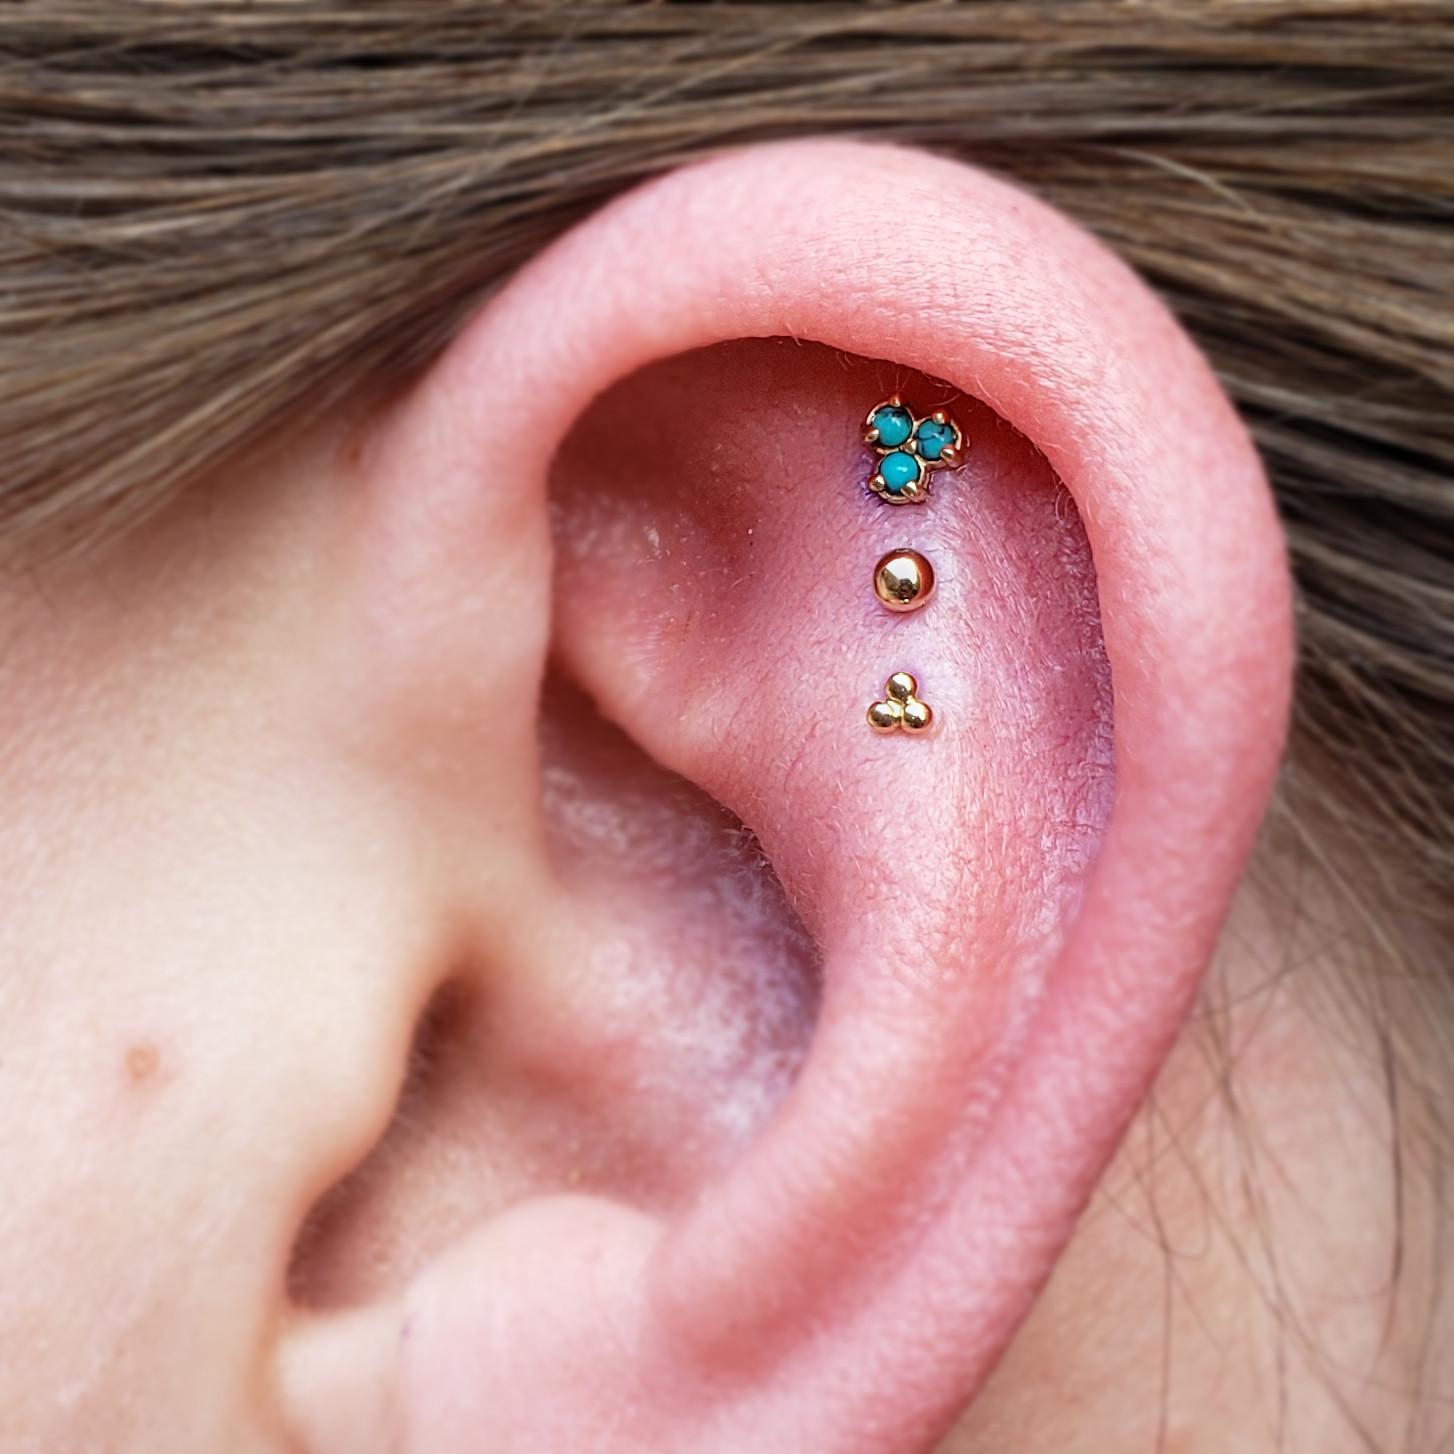 Three Piercings: Ear, Face, or Body